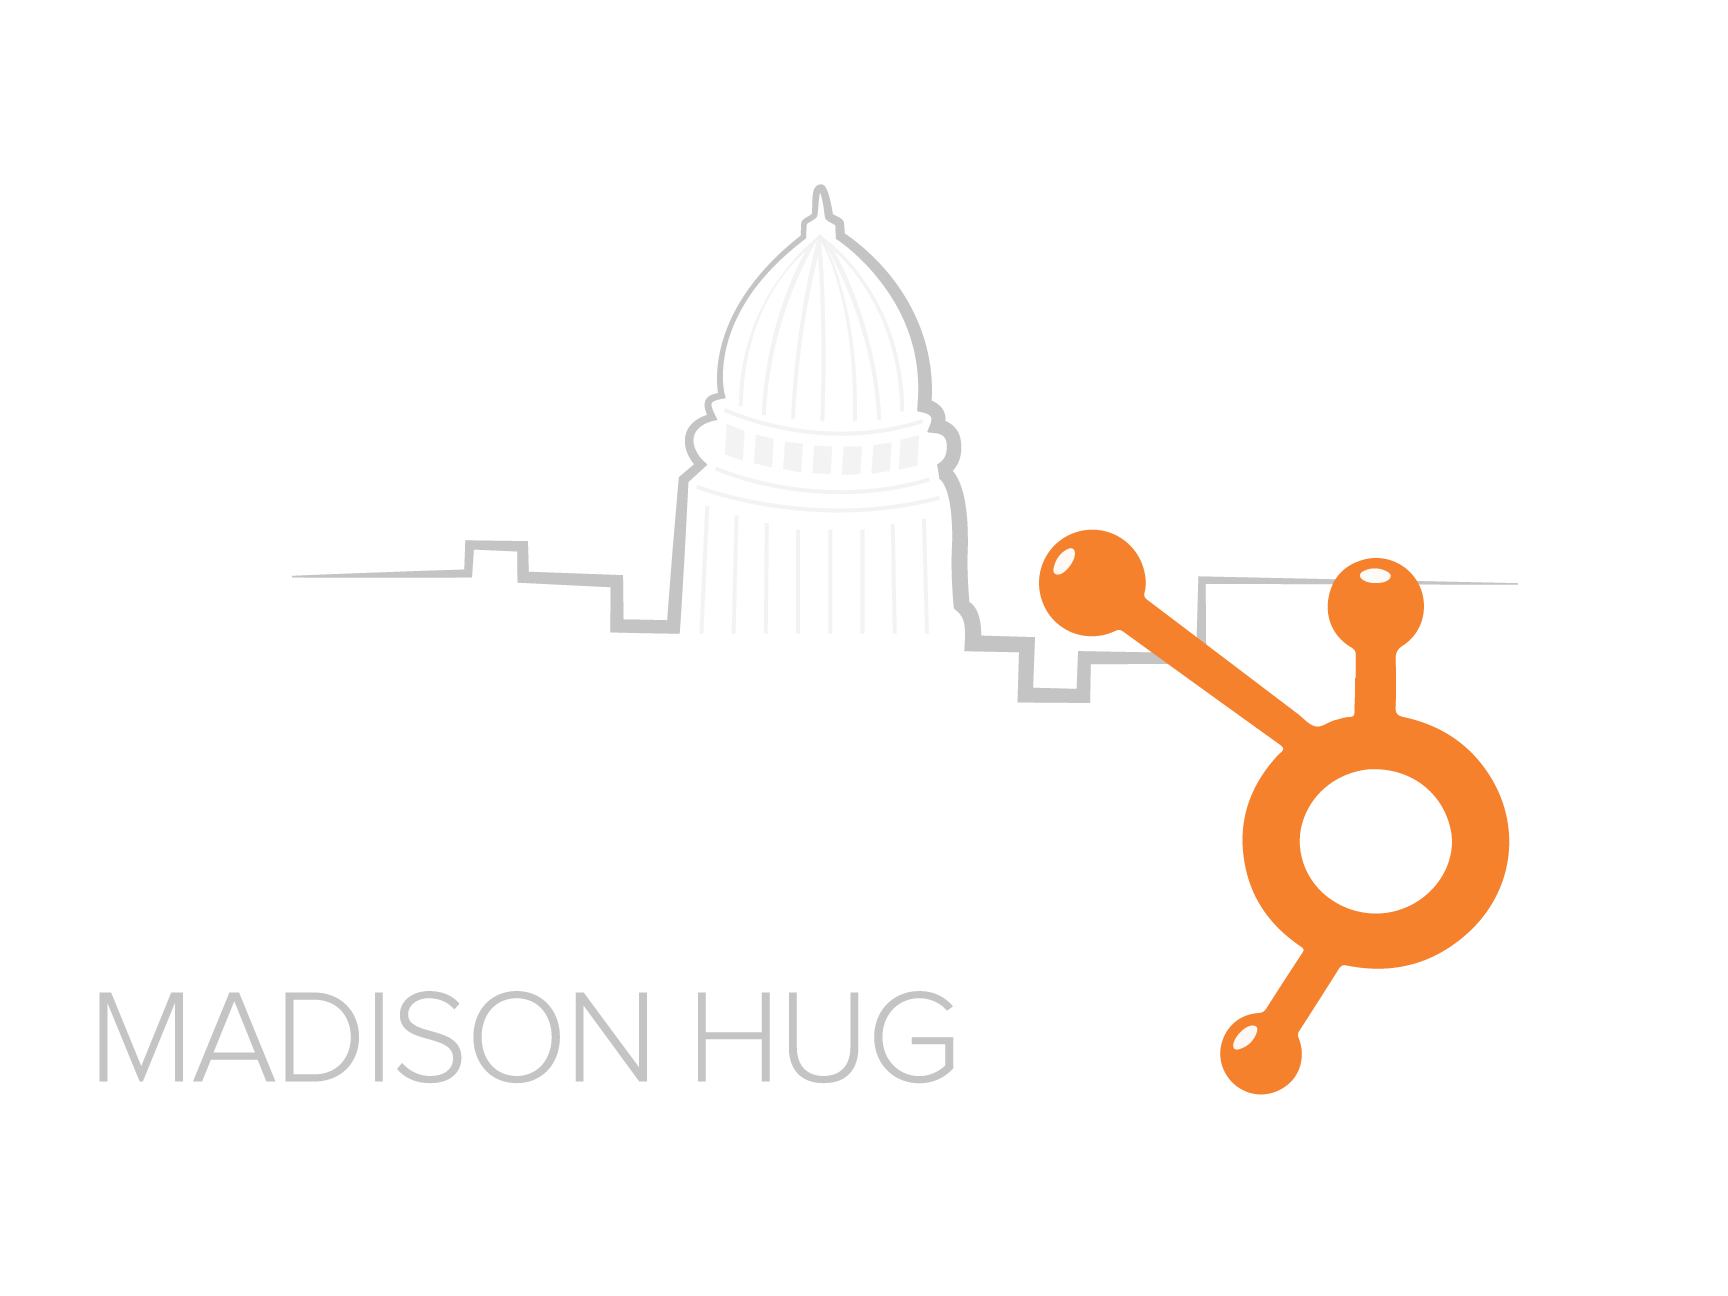 Madison HUG Logo